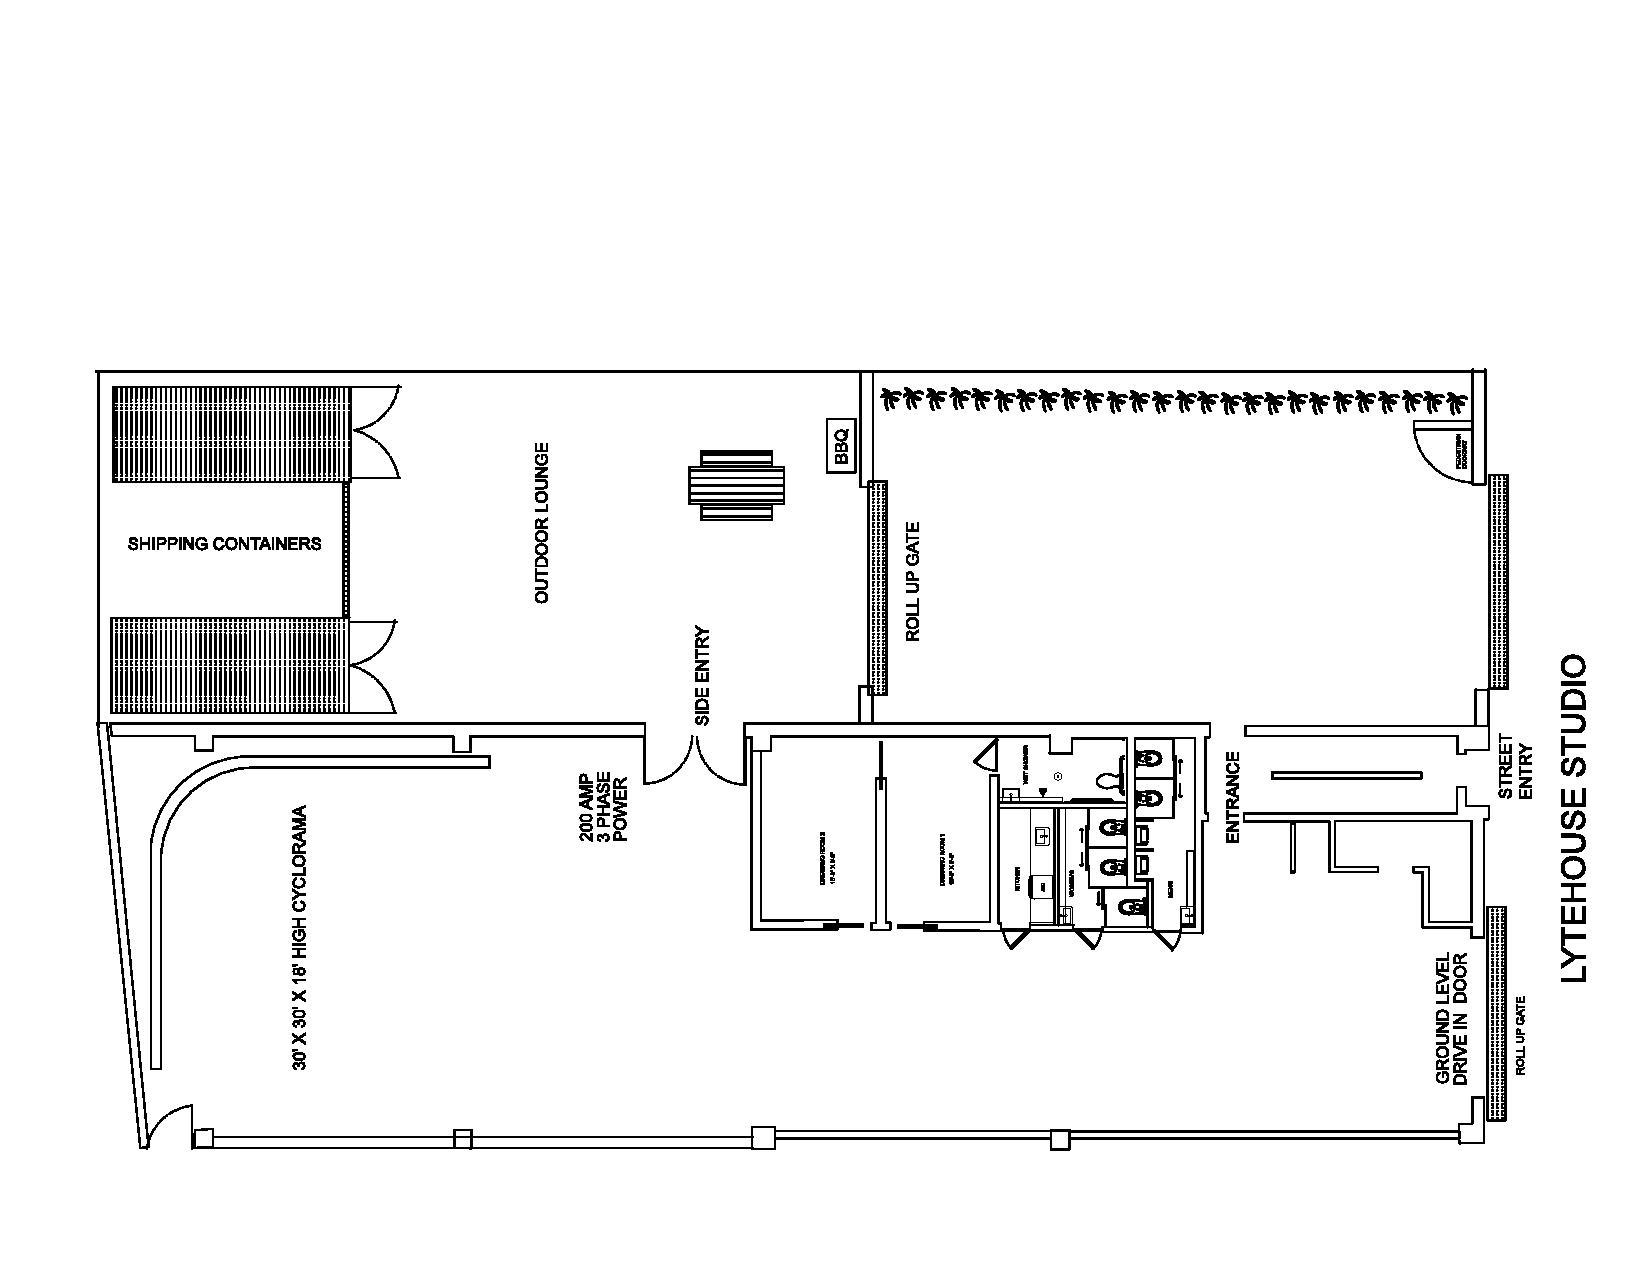 Photo frasier floor plan images 2d cad beauty salon for Photography studio floor plans